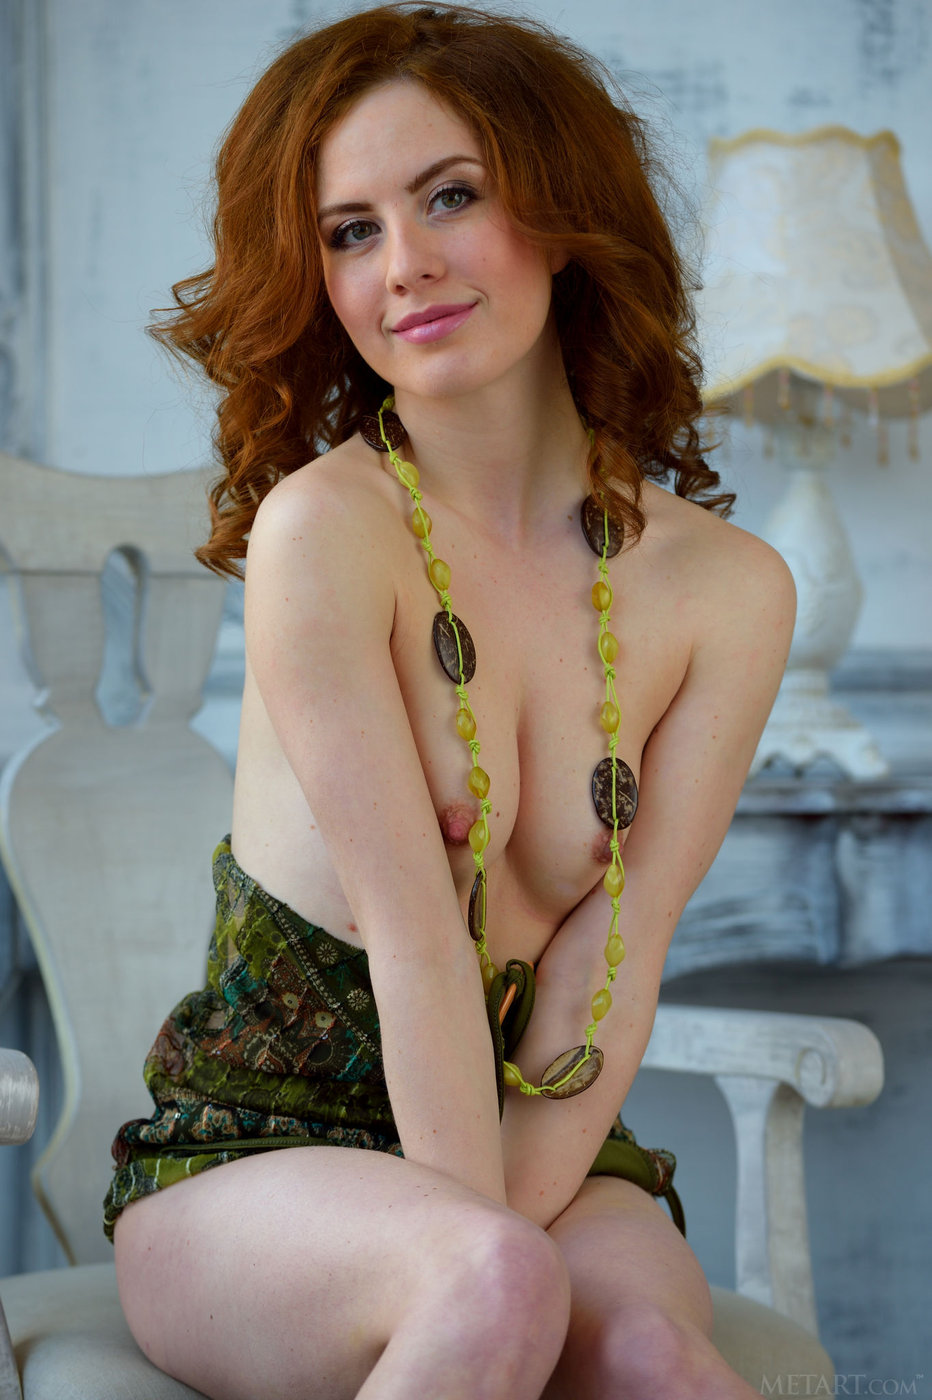 Redhead hairy pussy metart